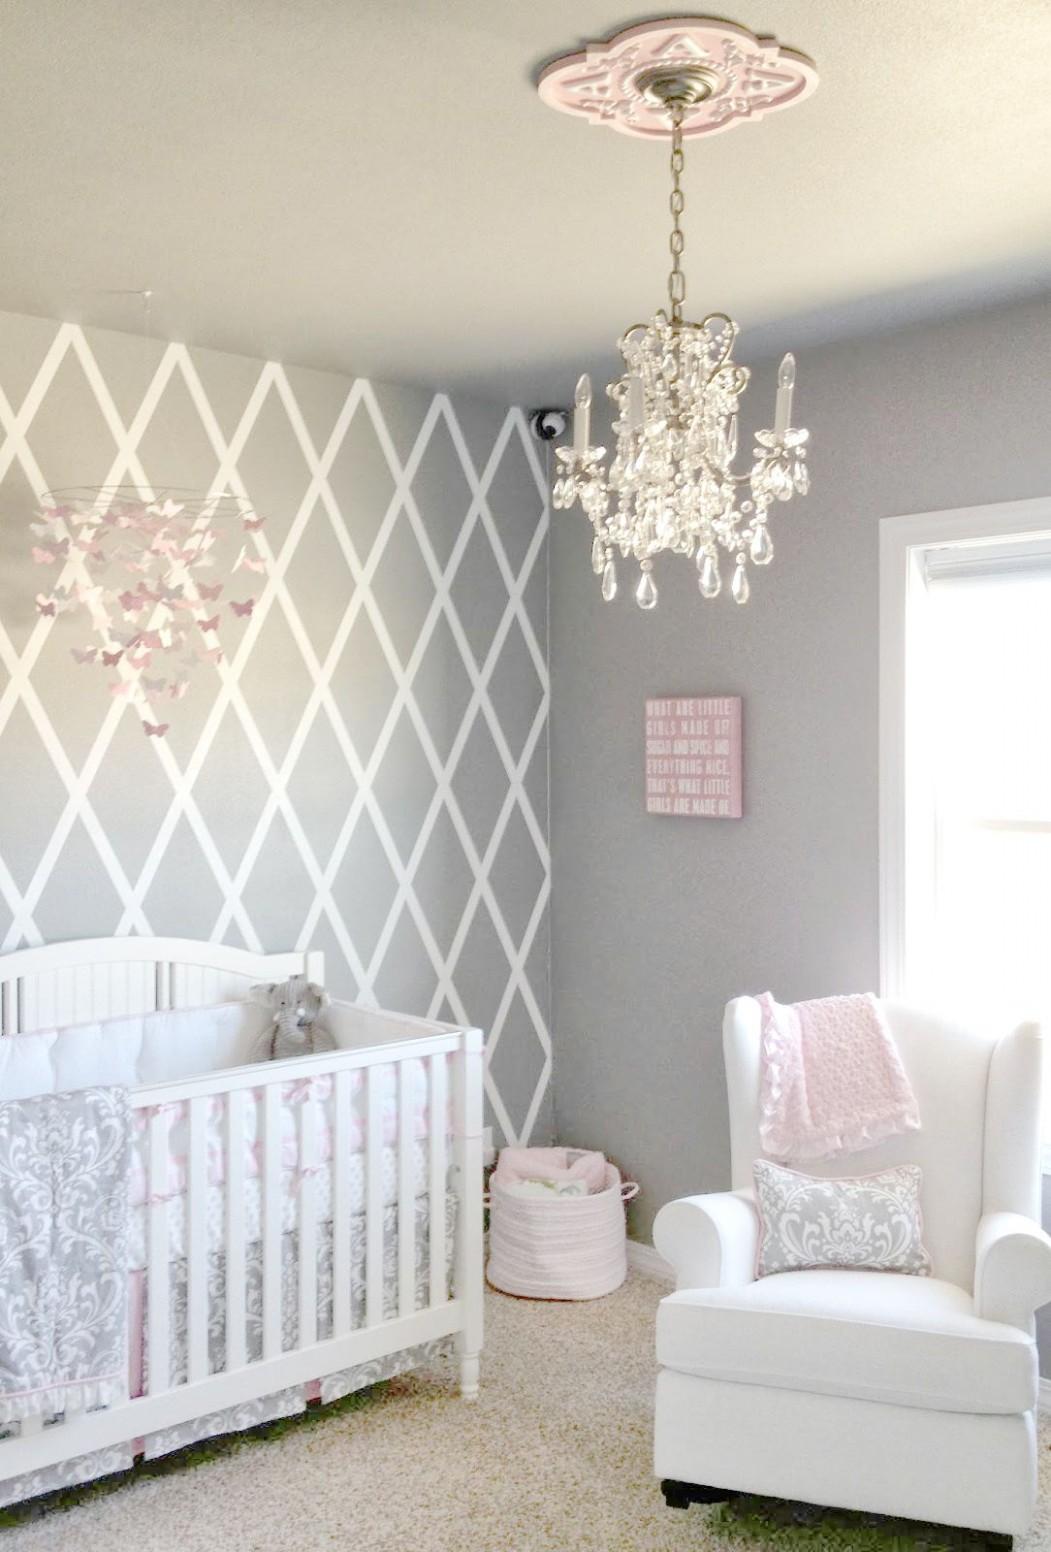 Pink and Gray Baby Bedding, Girl Baby Bedding  Baby girl room  - Baby Room Pinterest